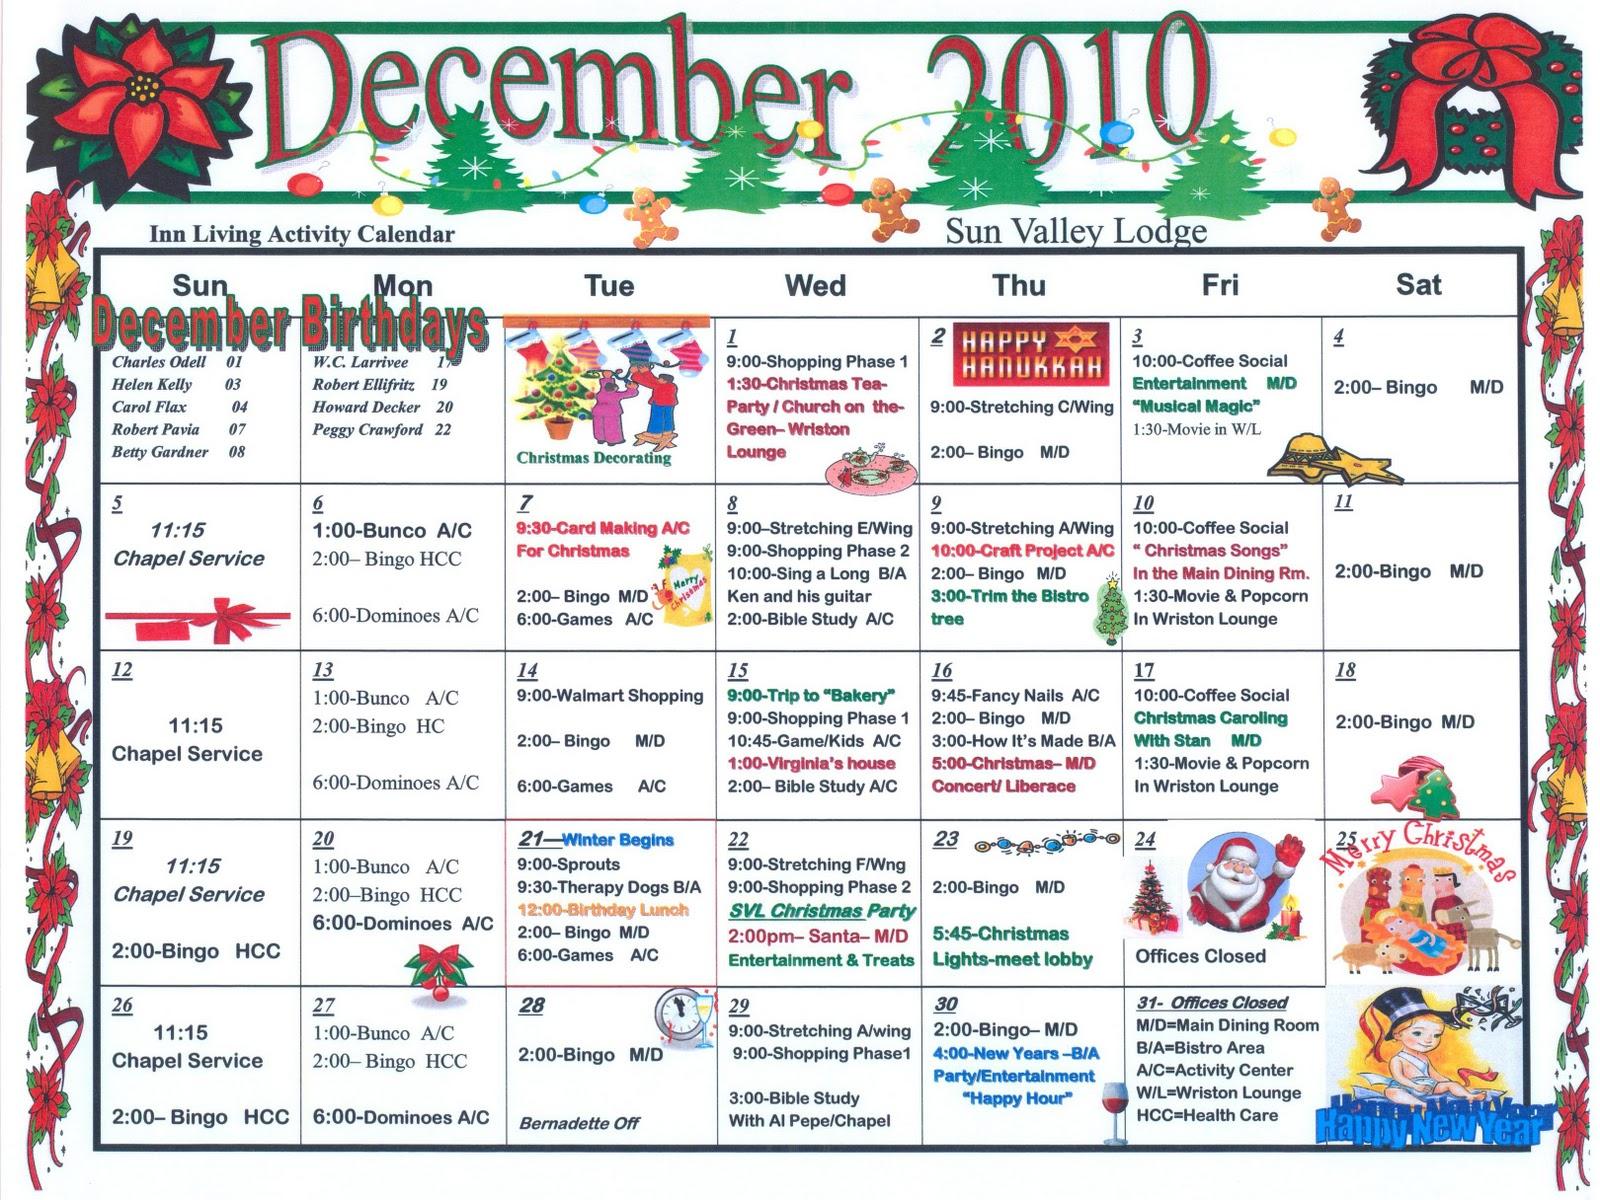 Calendar Ideas For Nursing Homes : Activities for nursing homes calendar